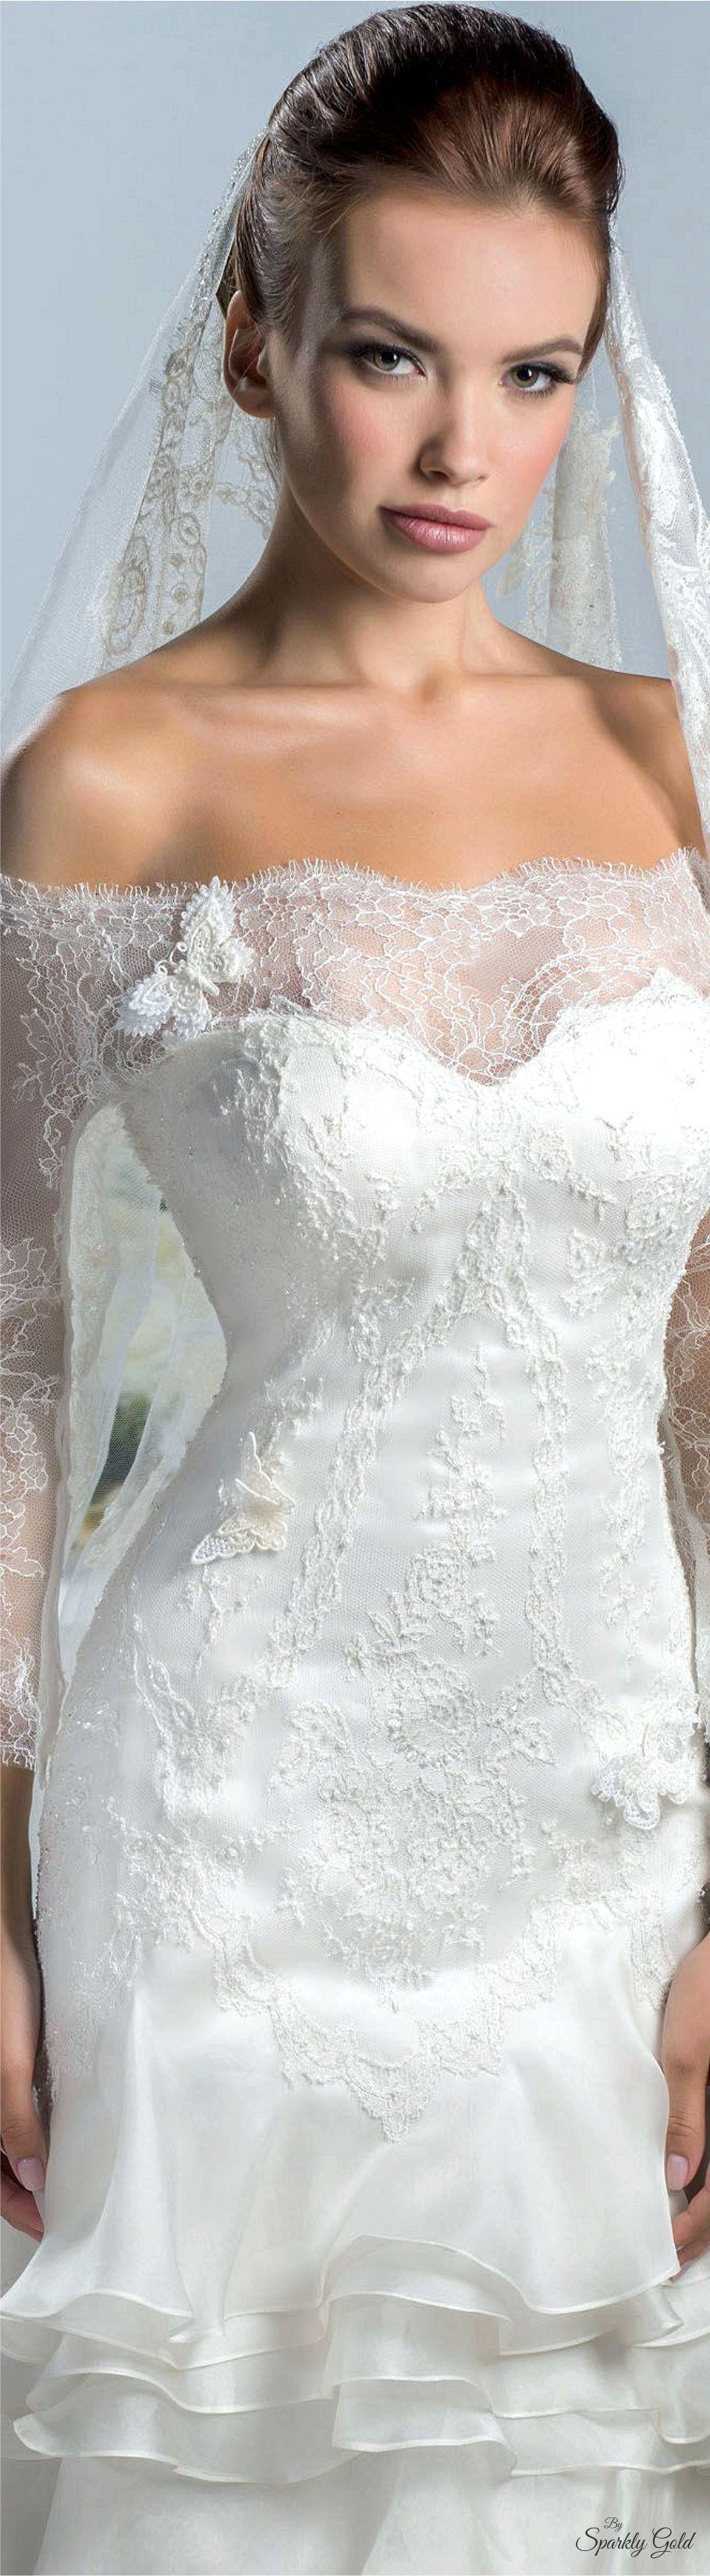 Saher Dia Spring 2016 Bridal